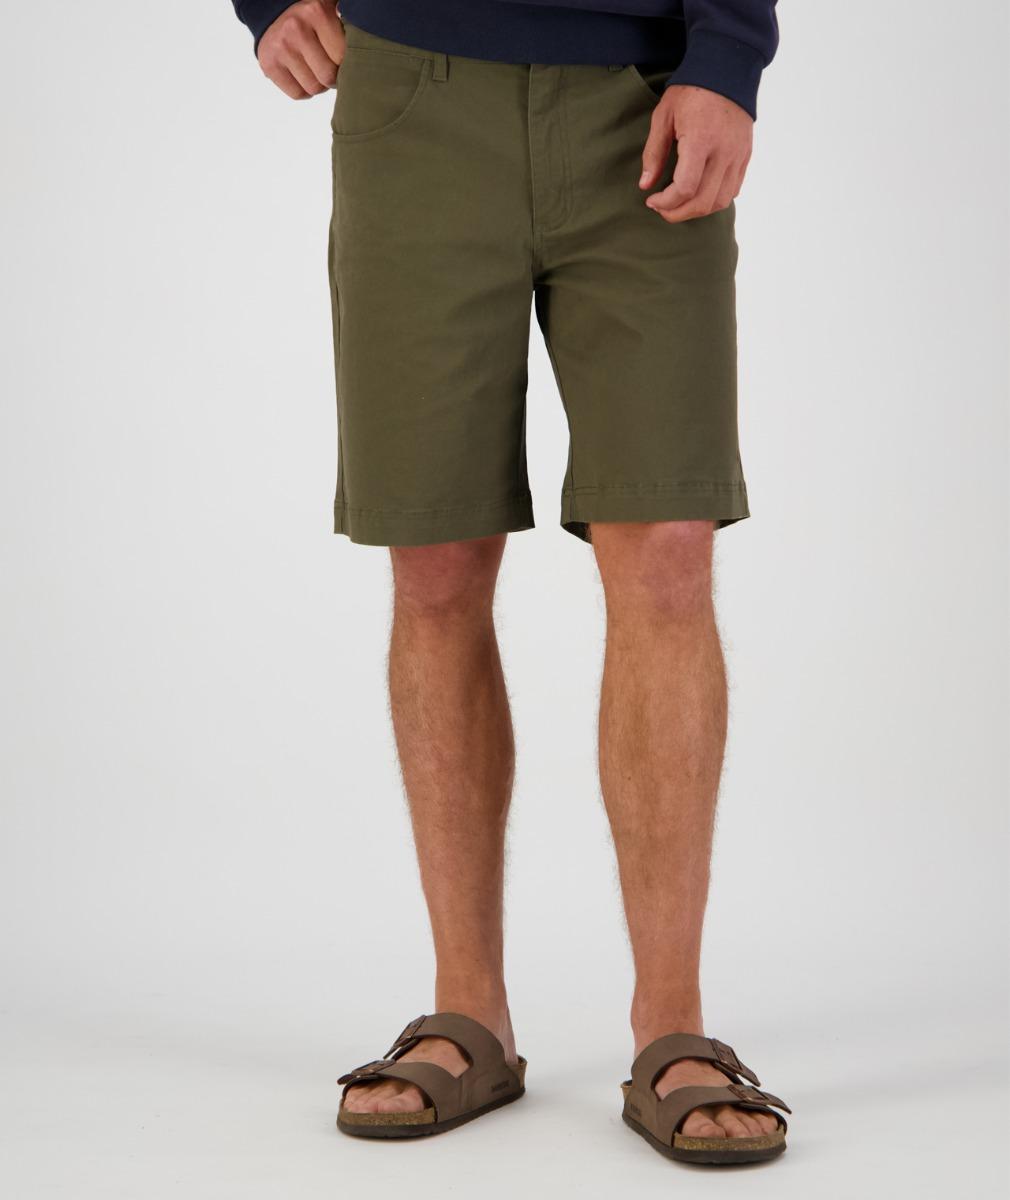 Swanndri Men's Collingwood Stretch Shorts in Dark Khaki